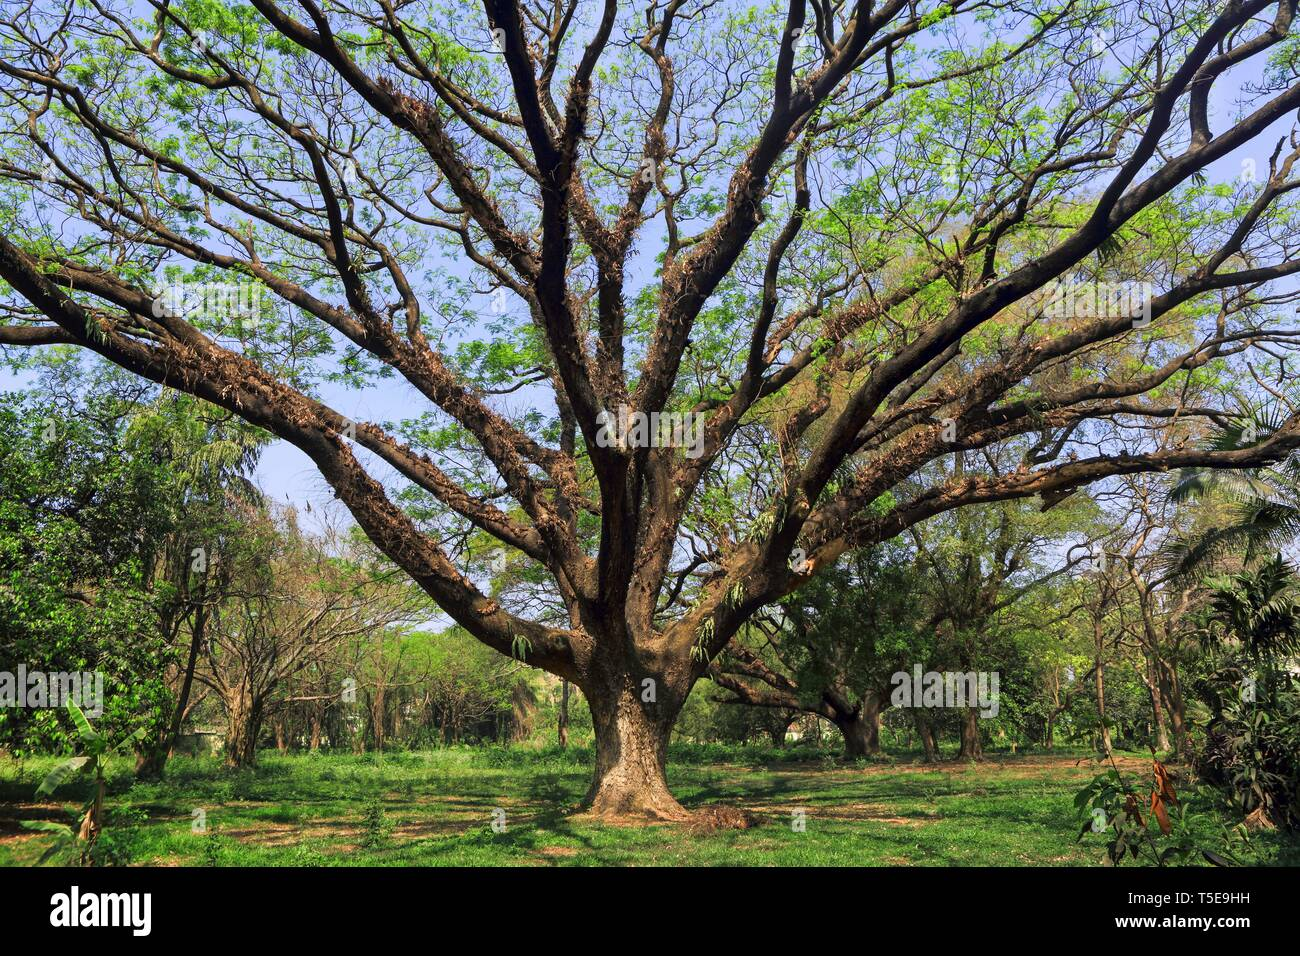 tree, Acharya Jagadish Chandra Bose, Botanic Garden, West Bengal, India, Asia - Stock Image